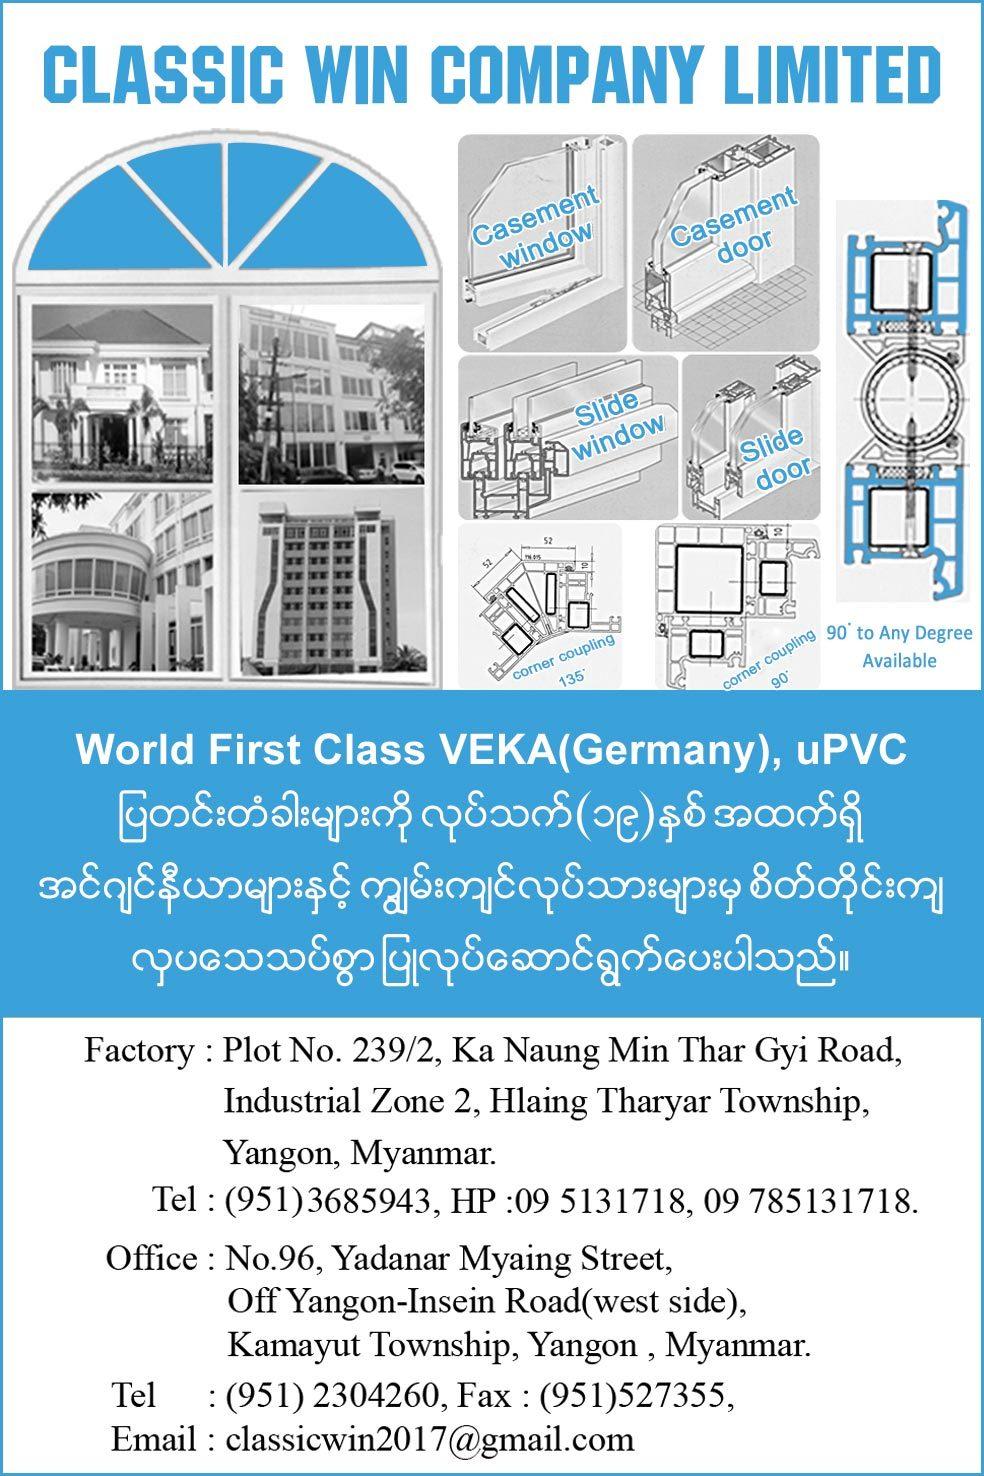 Classic-Win-Company-Limited_Aluminium-Frames-&-Furnitures_(B)_1916.jpg